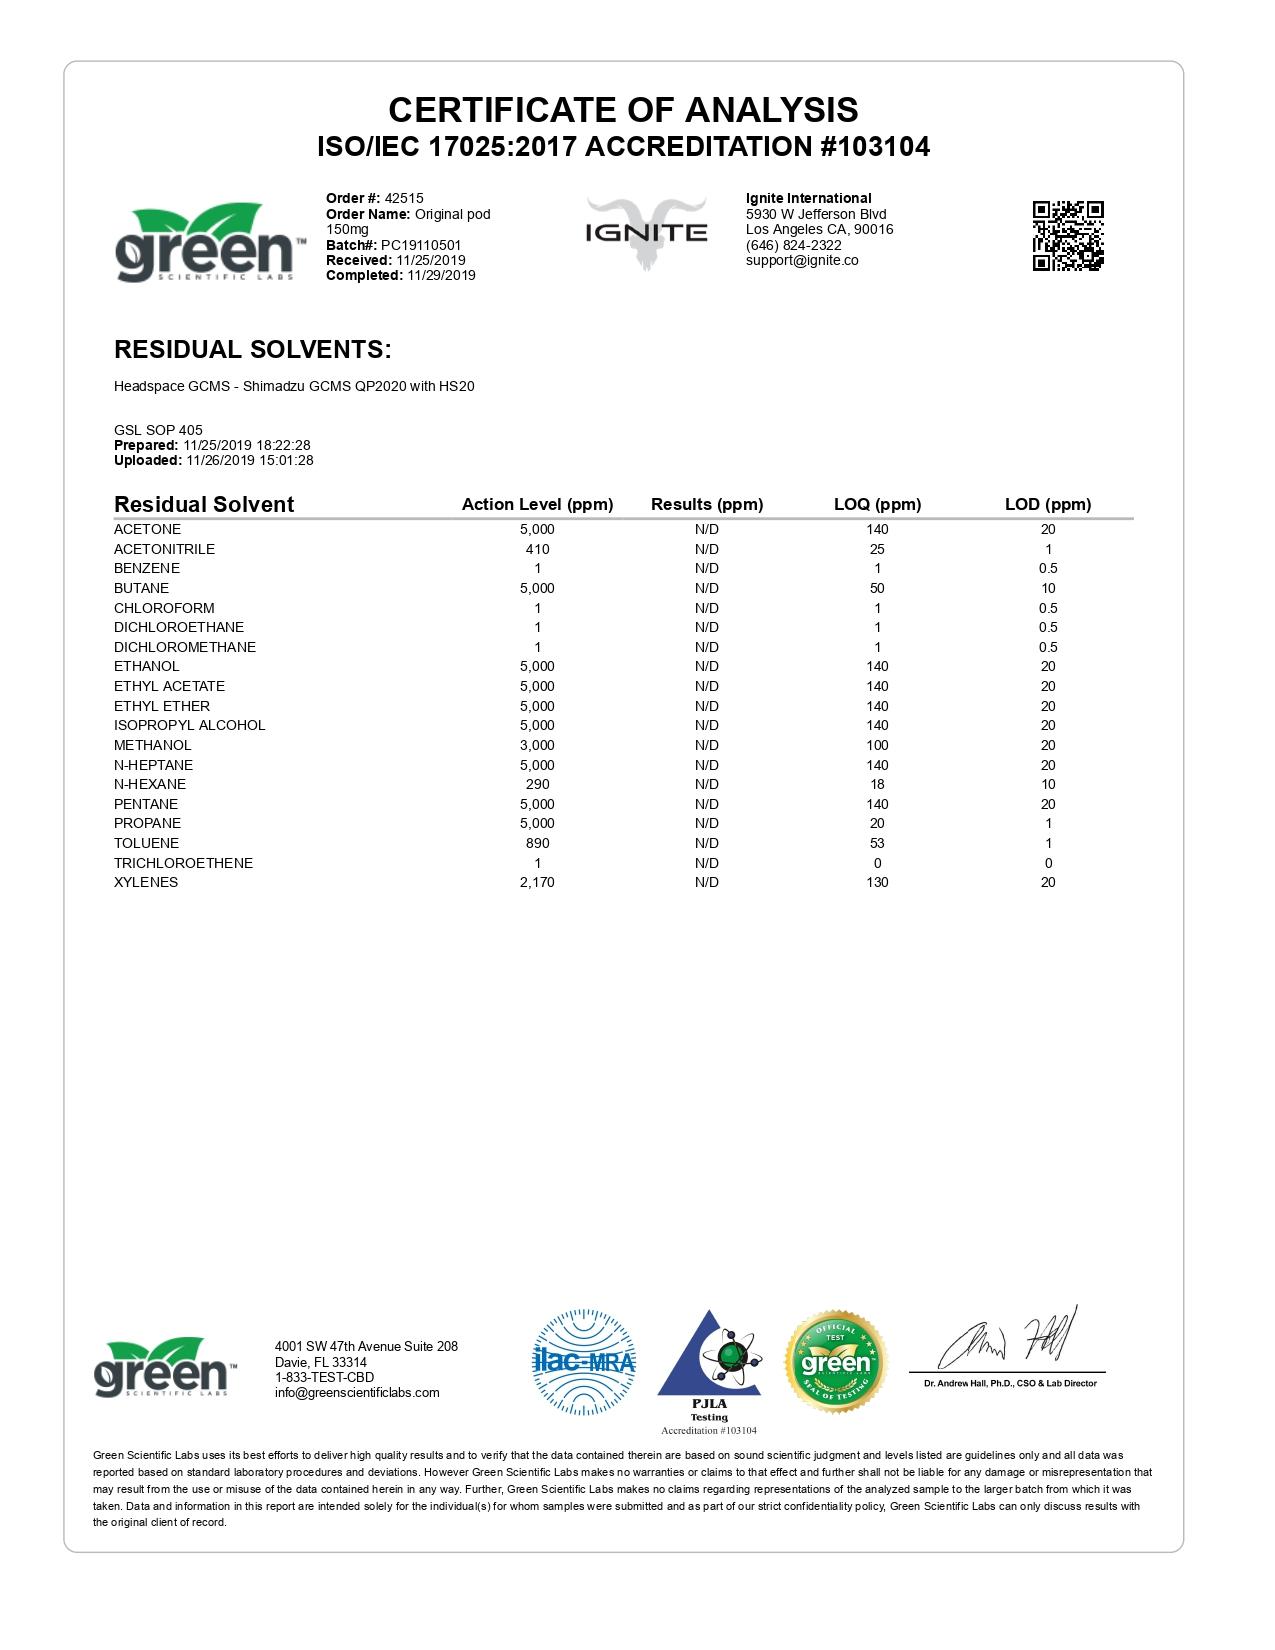 IGNITE CBD Pod Original Unflavored Lab Report